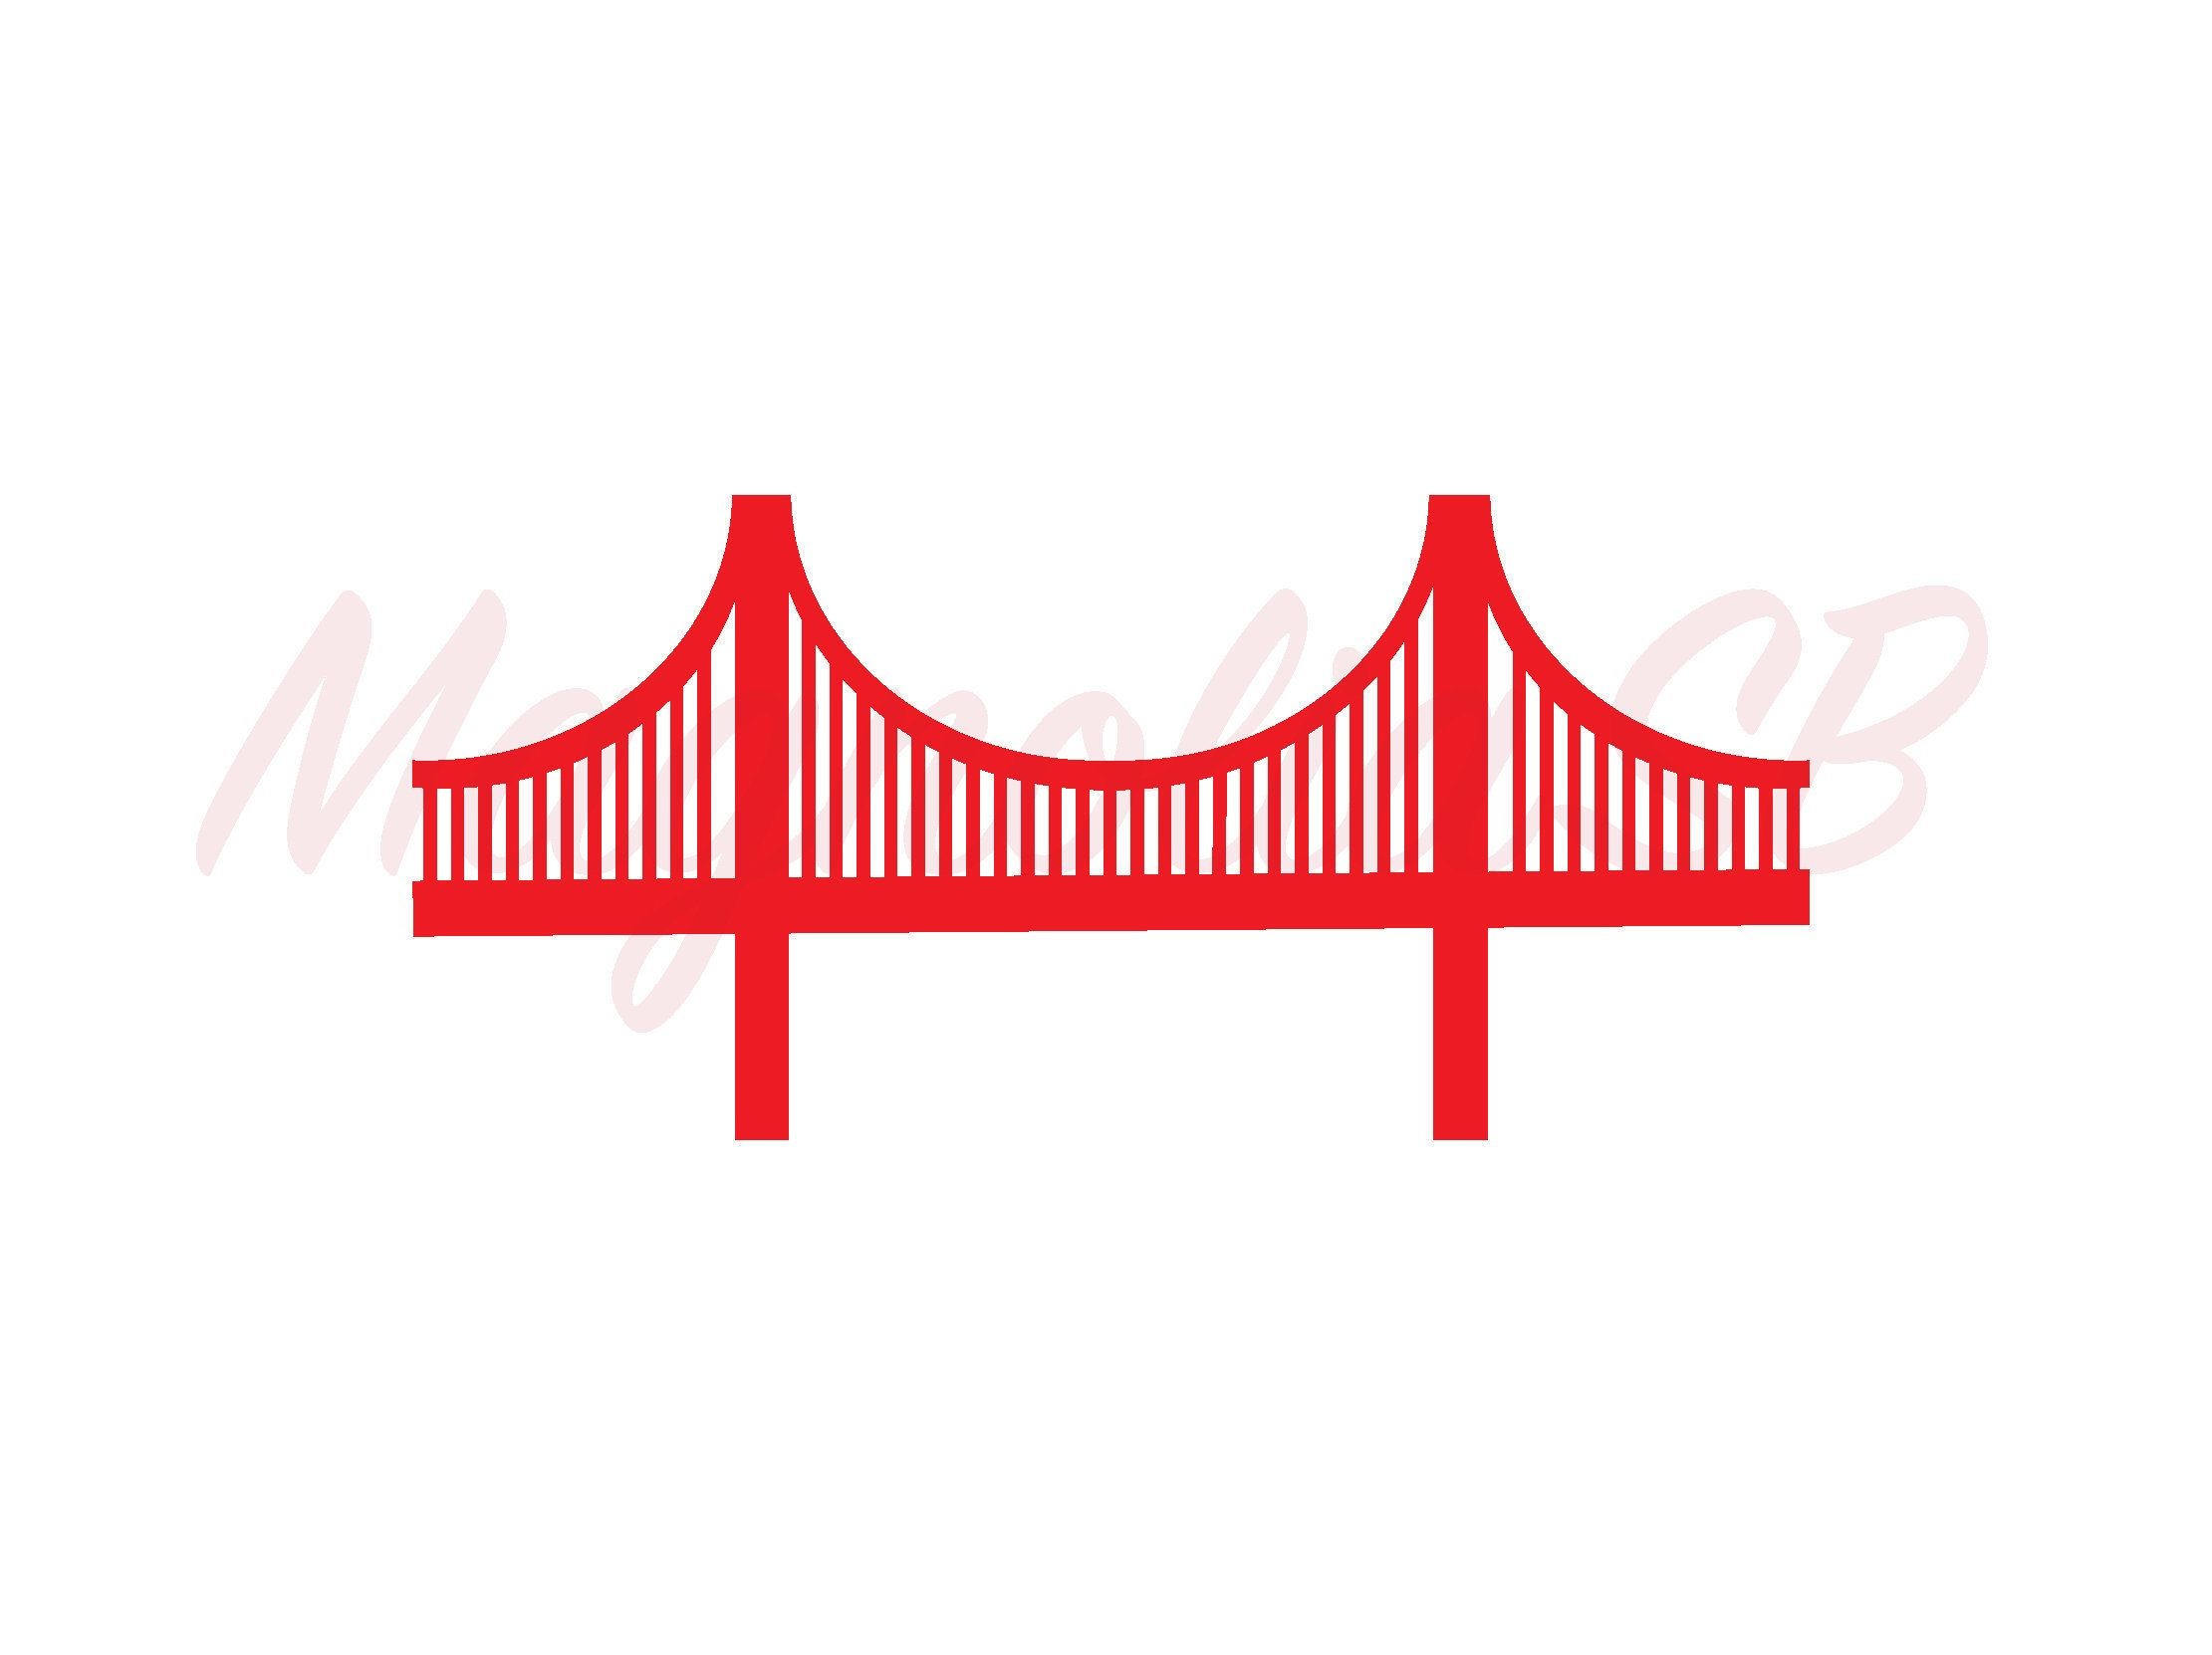 medium resolution of golden gate bridge svg golden gate bridge dxf golden gate bridge clipart